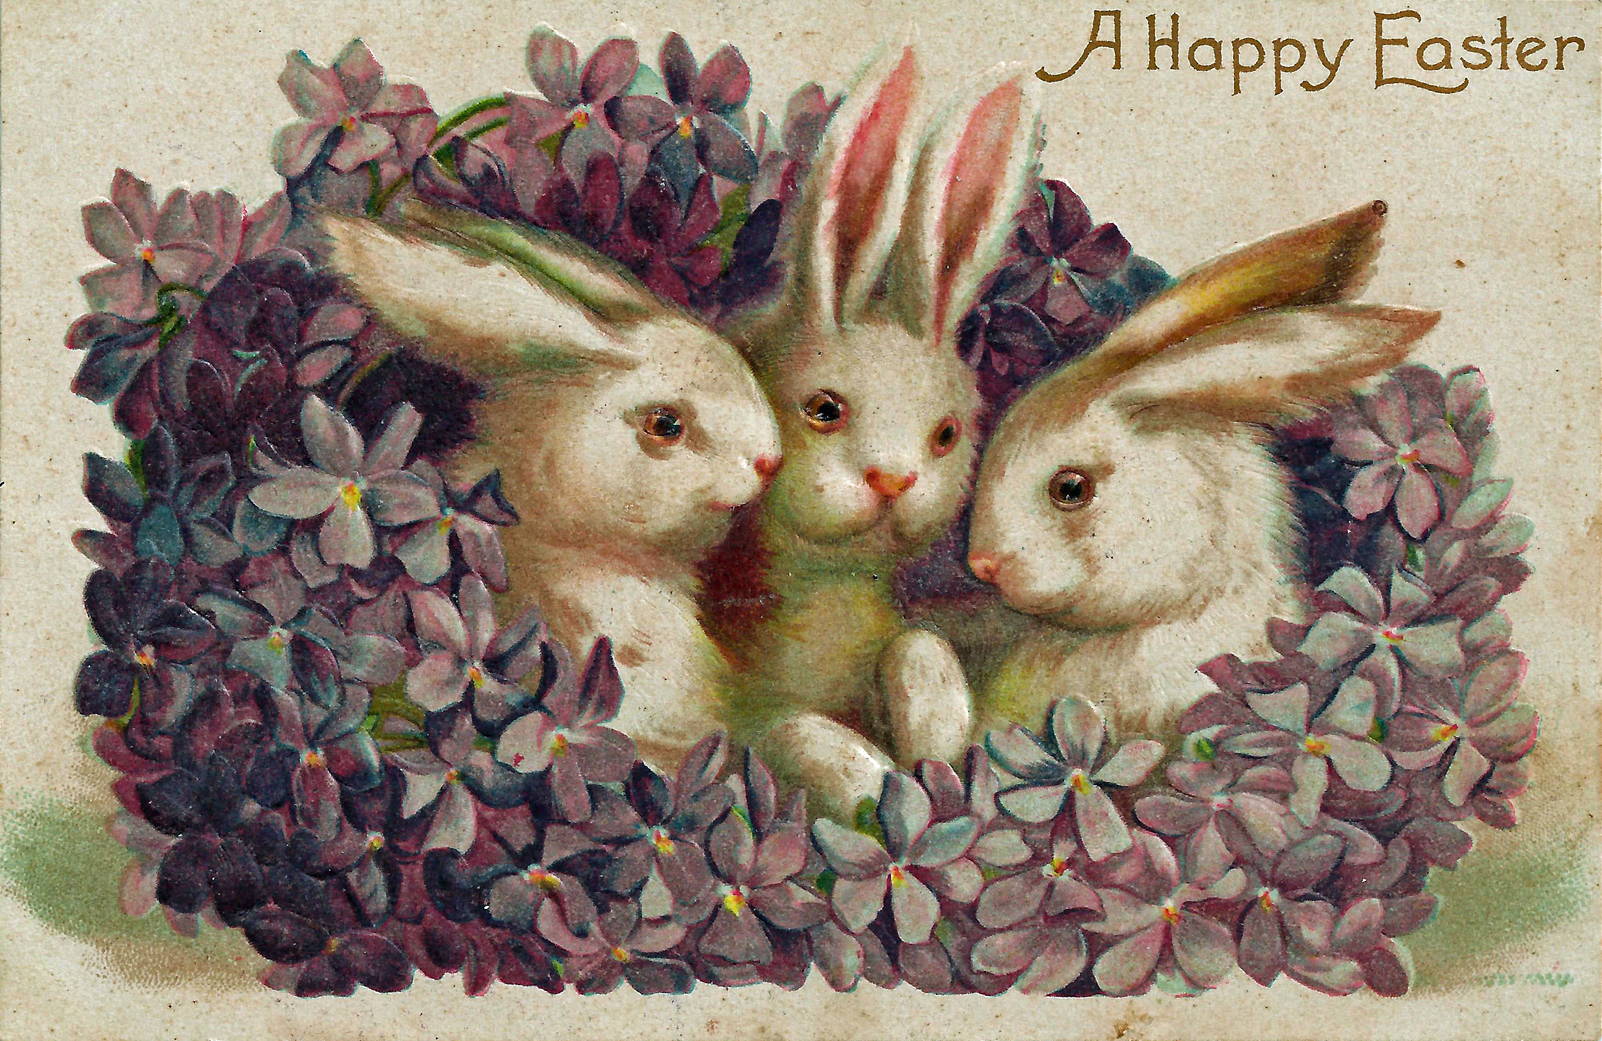 Happy Easter! Joyeuses Pâques!